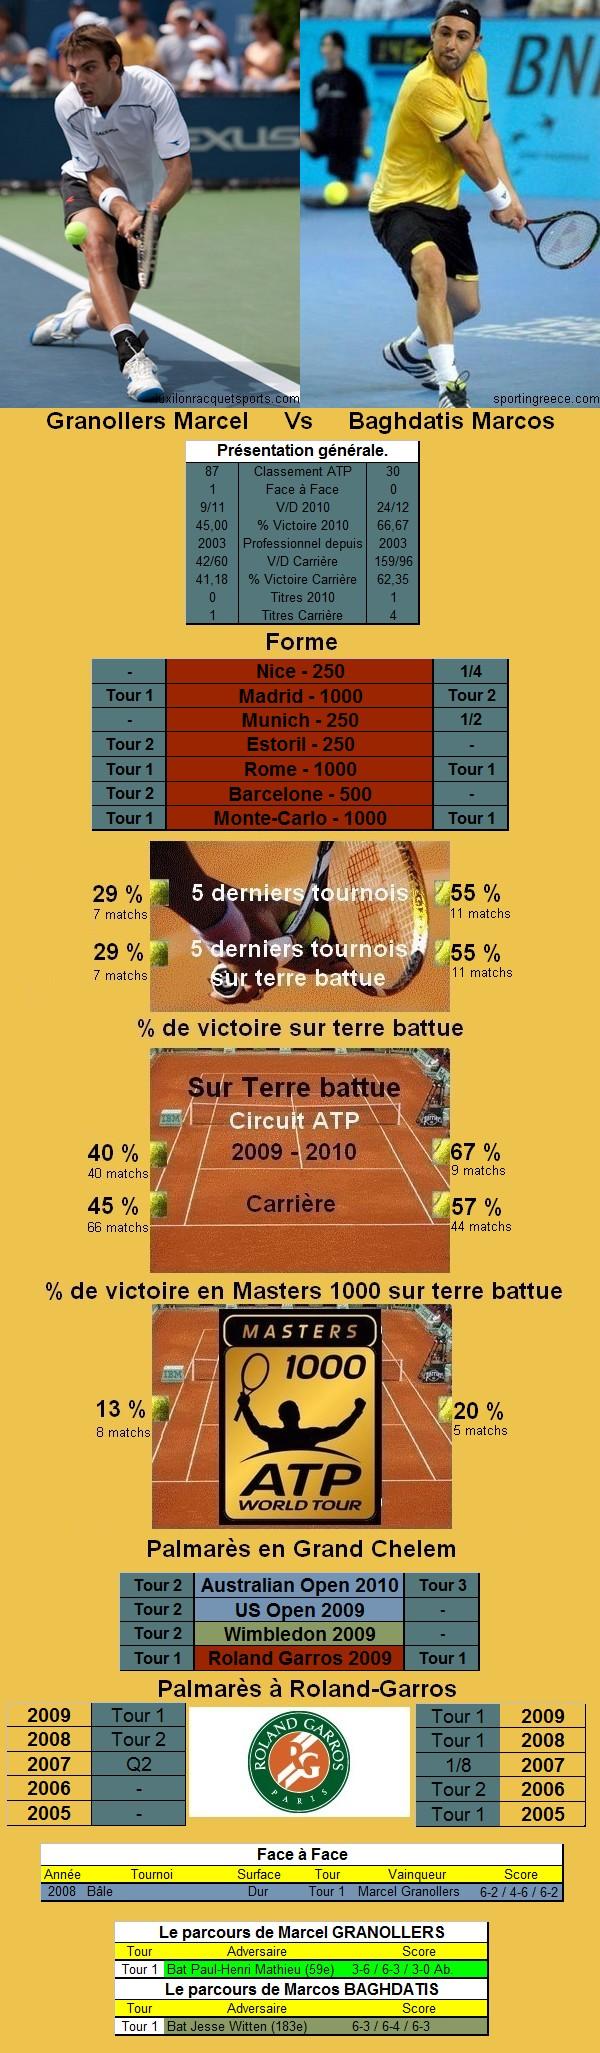 Statistiques tennis de Granollers contre Baghdatis à Roland Garros